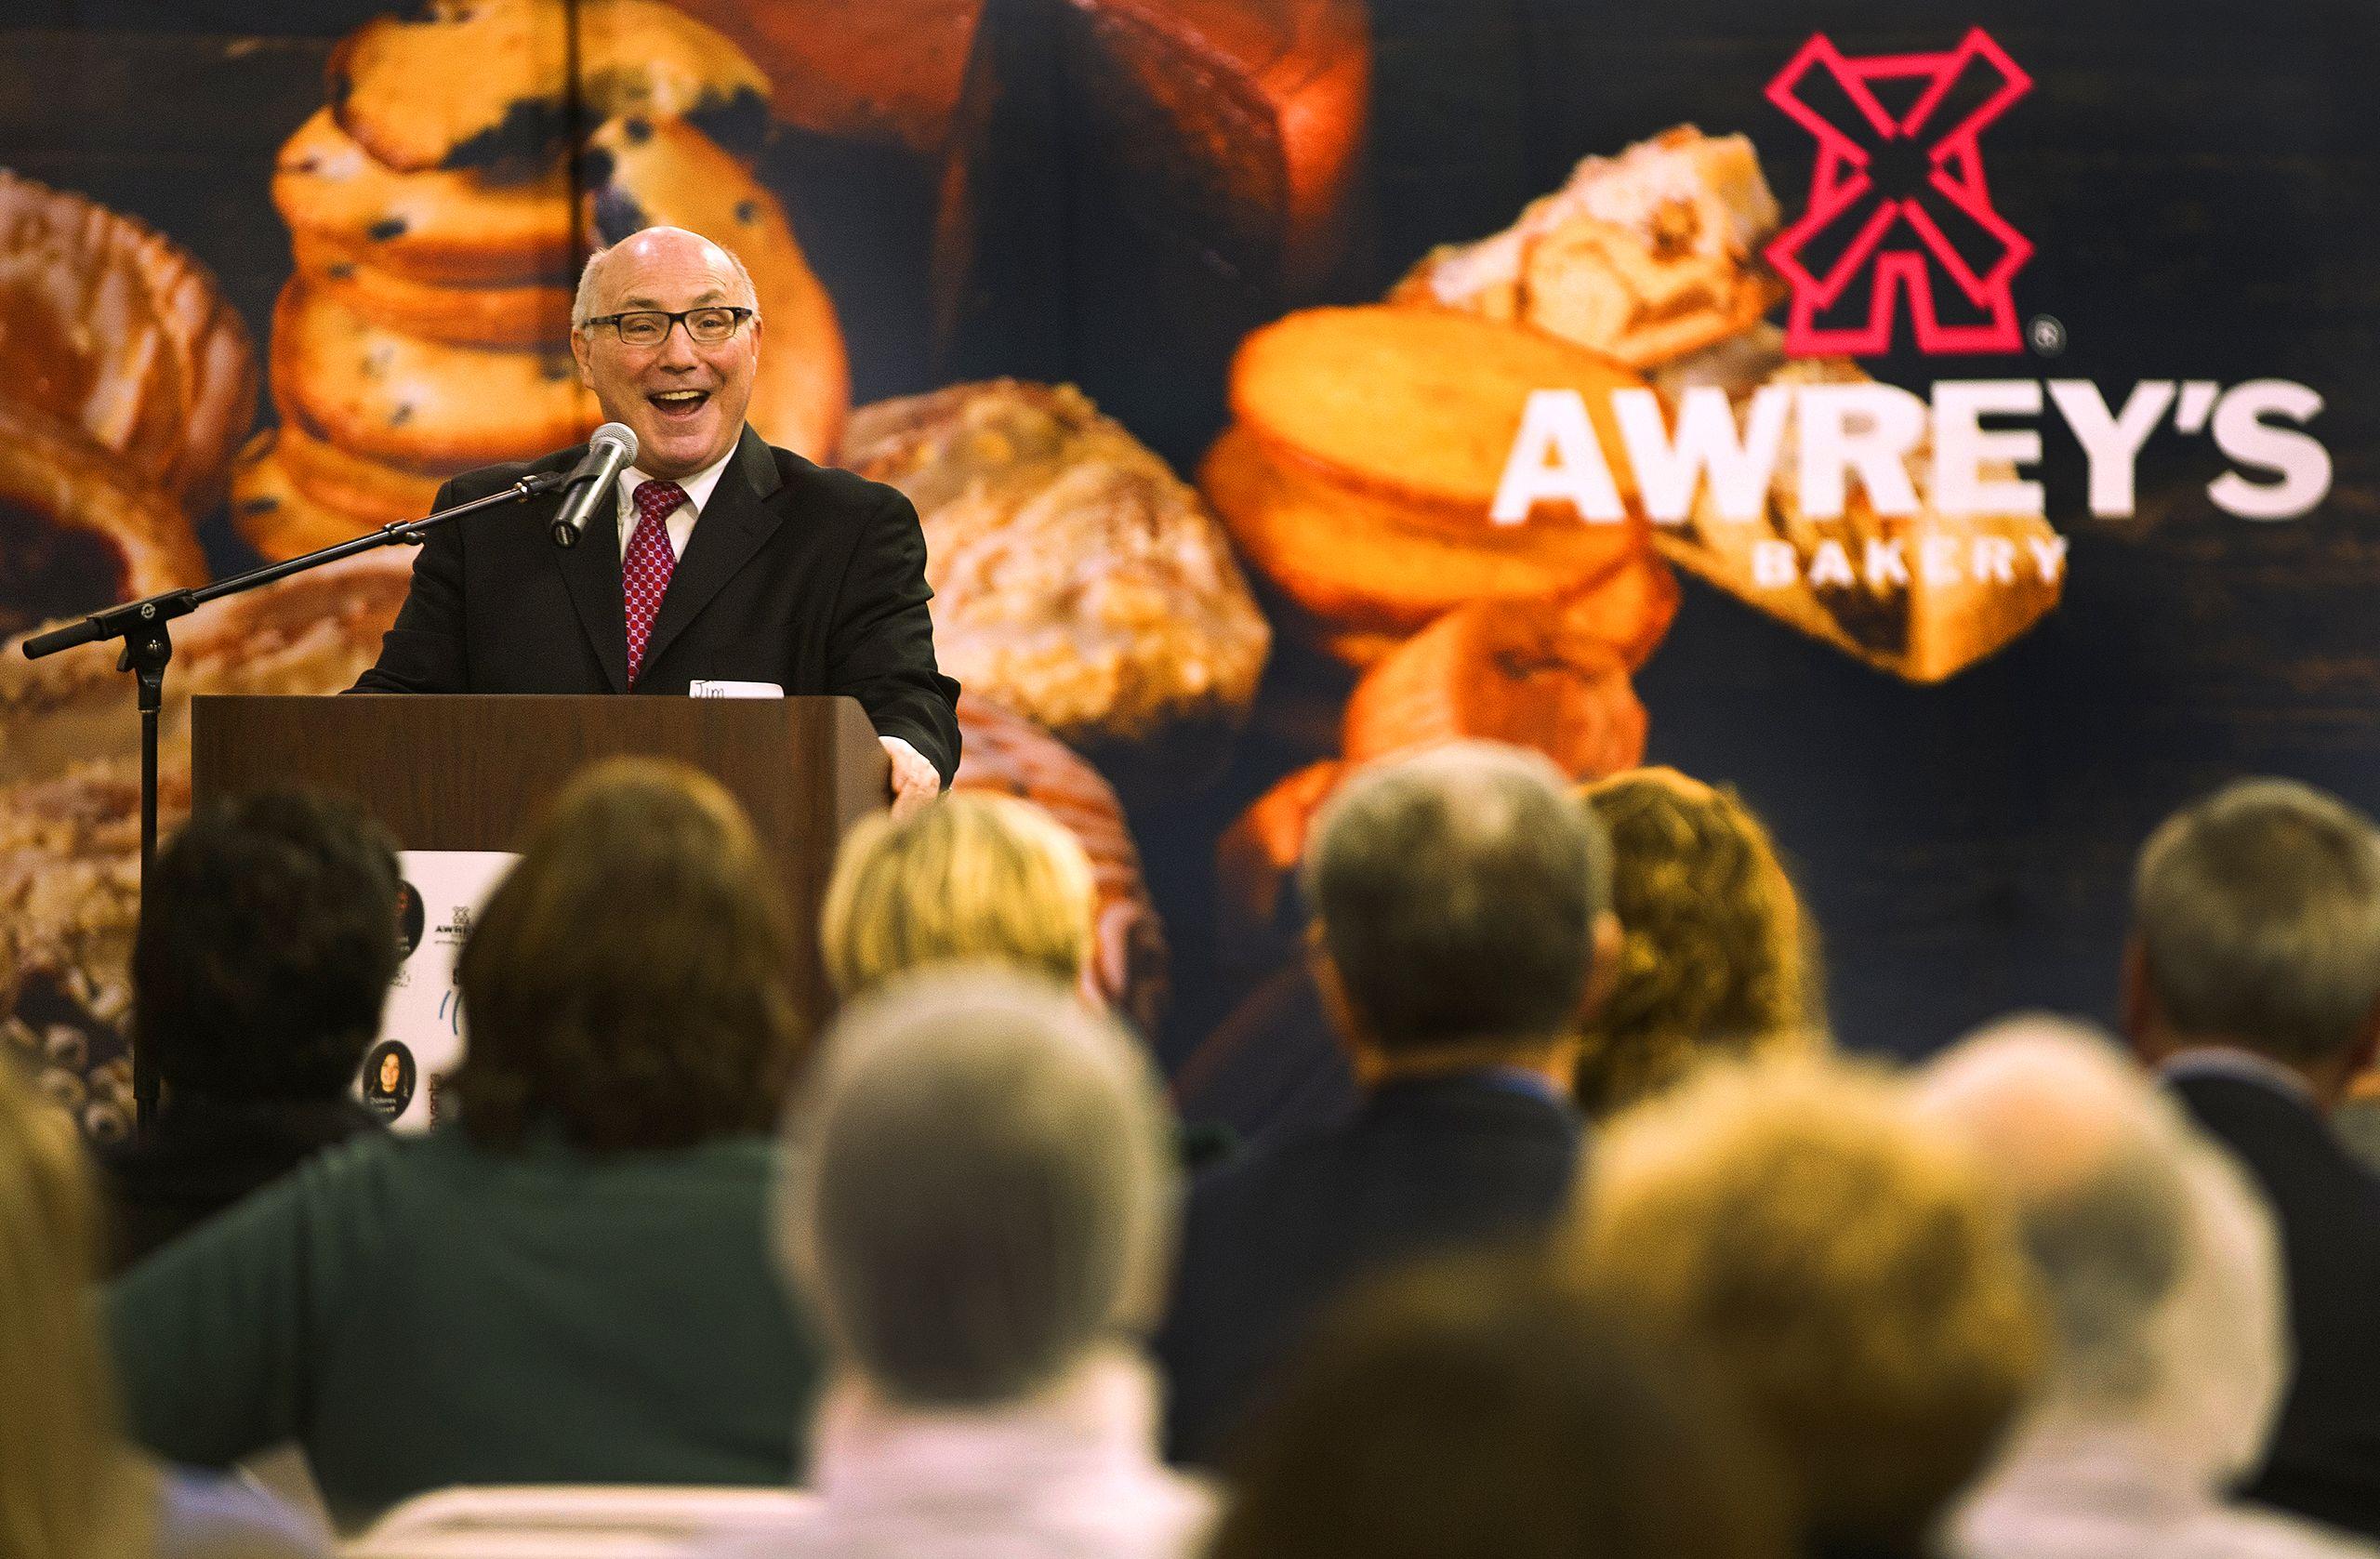 Awrey's Bakery Event